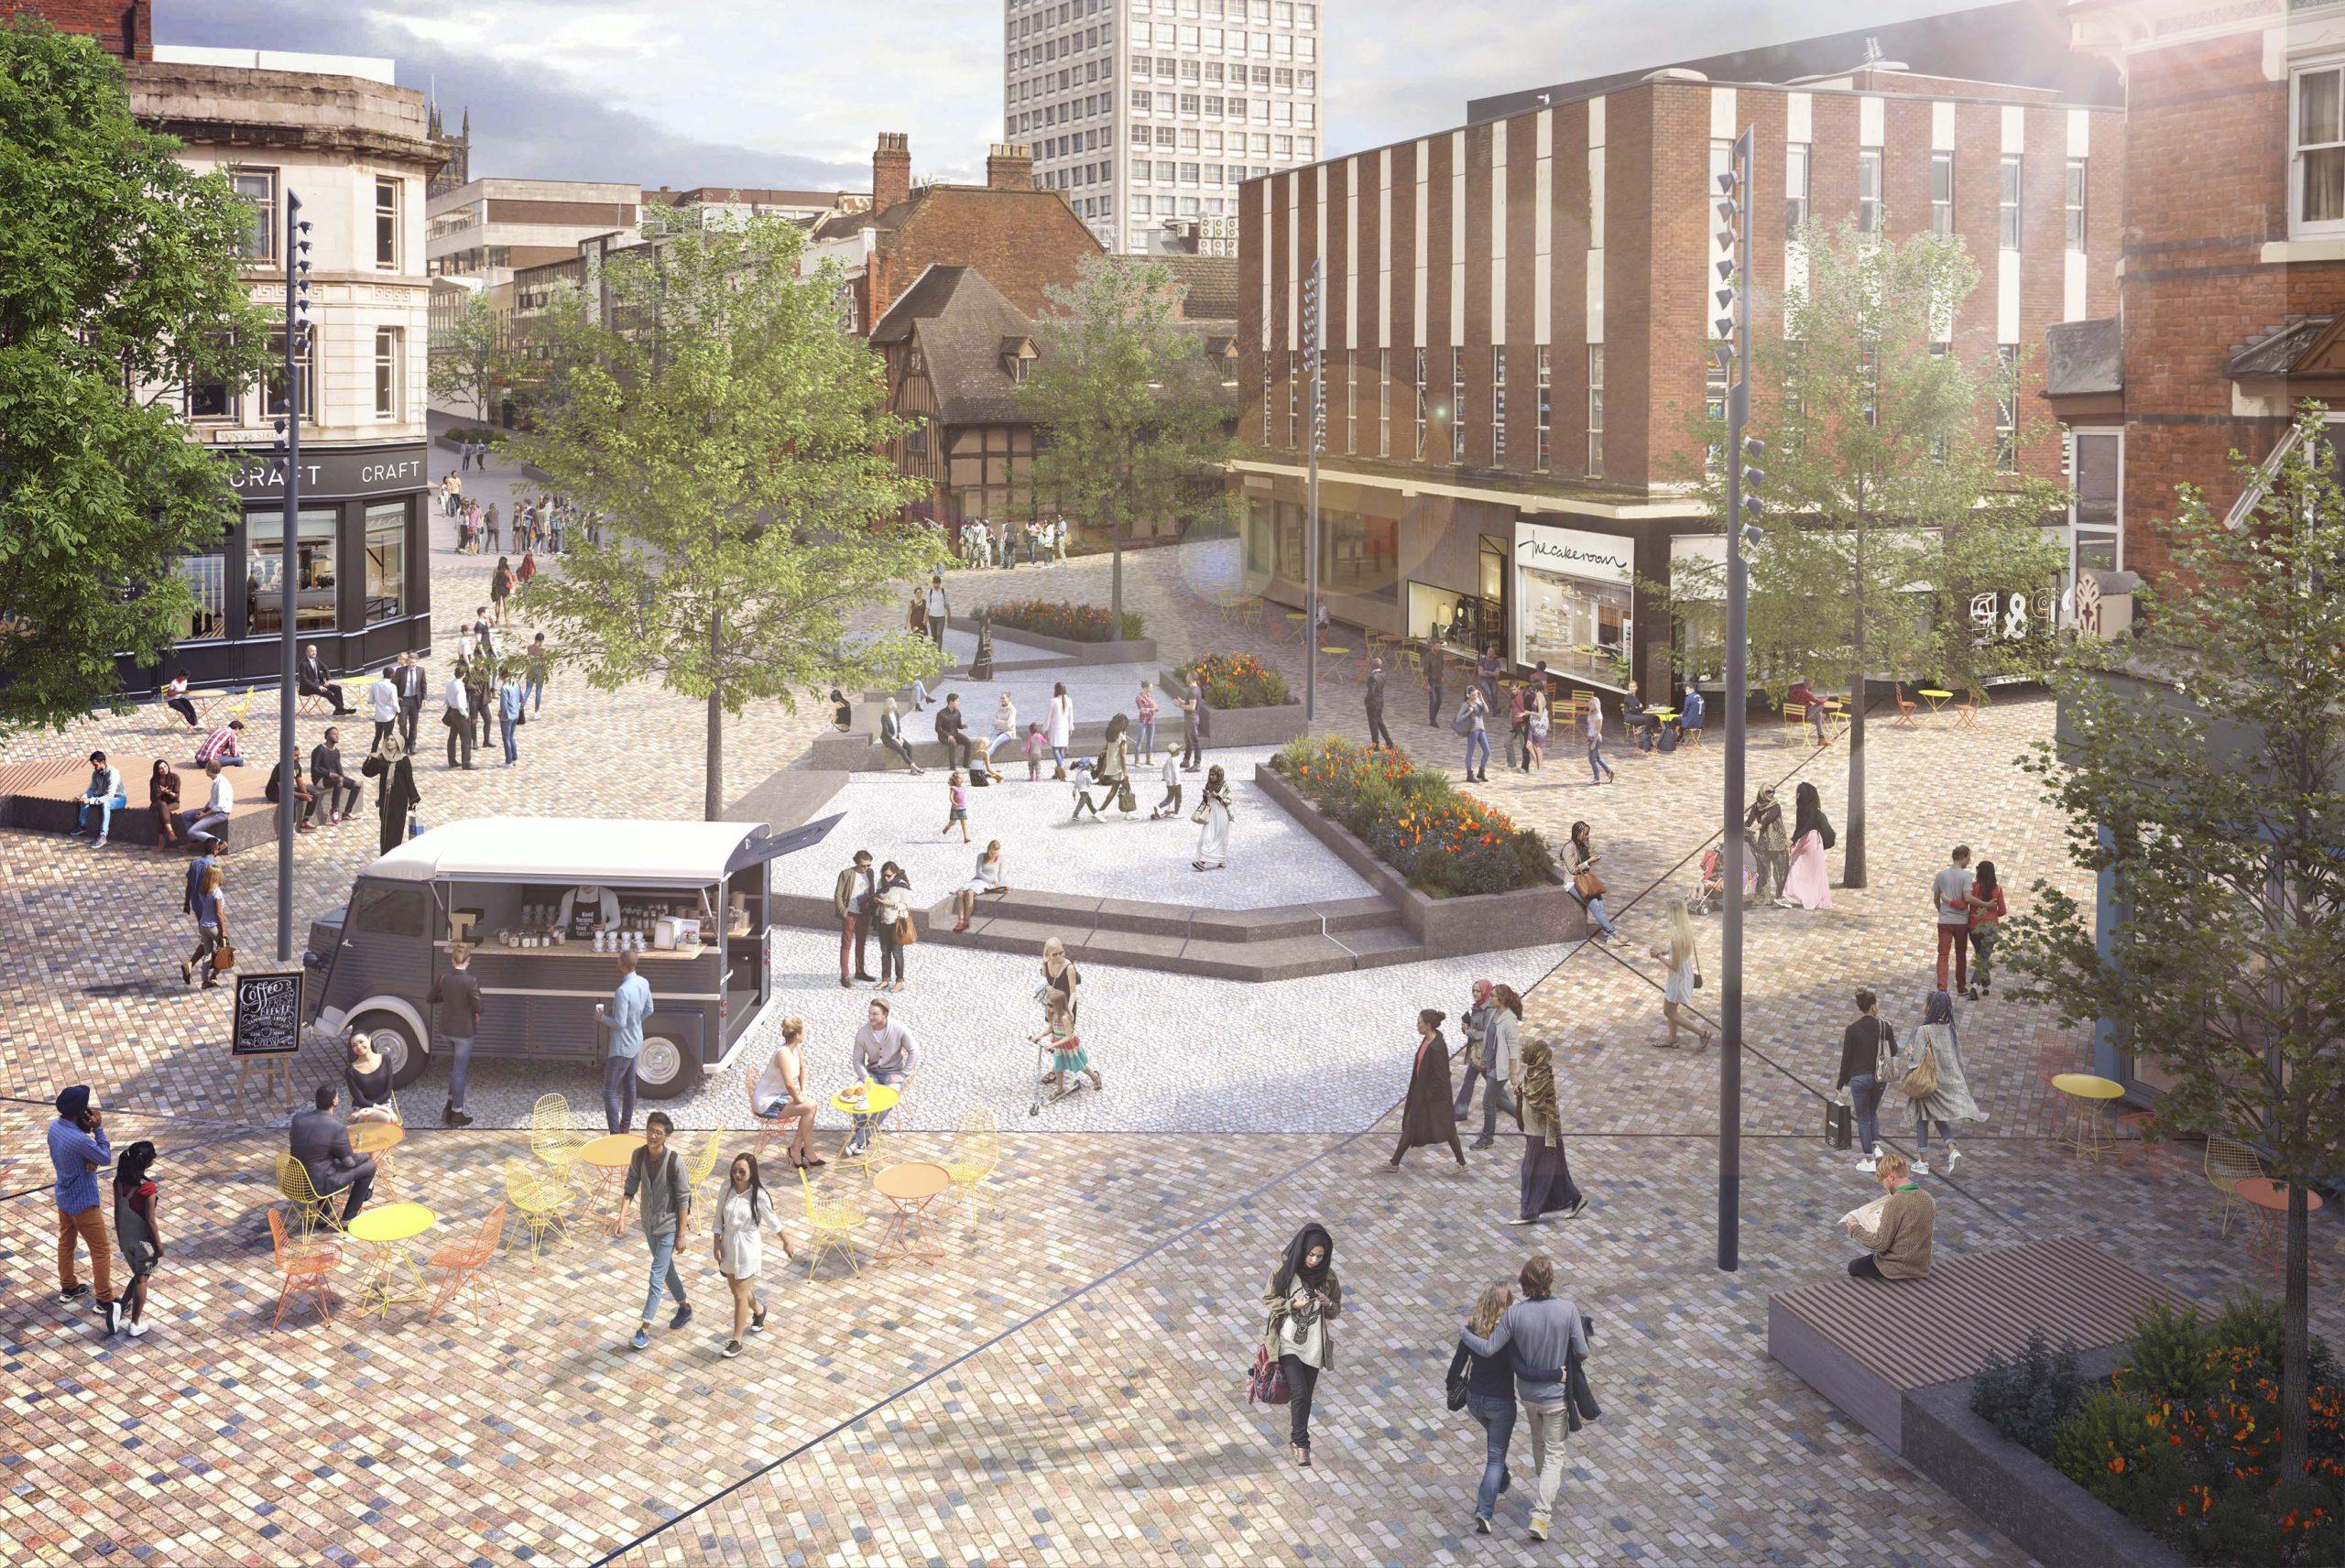 Council progresses plans for new-look city centre